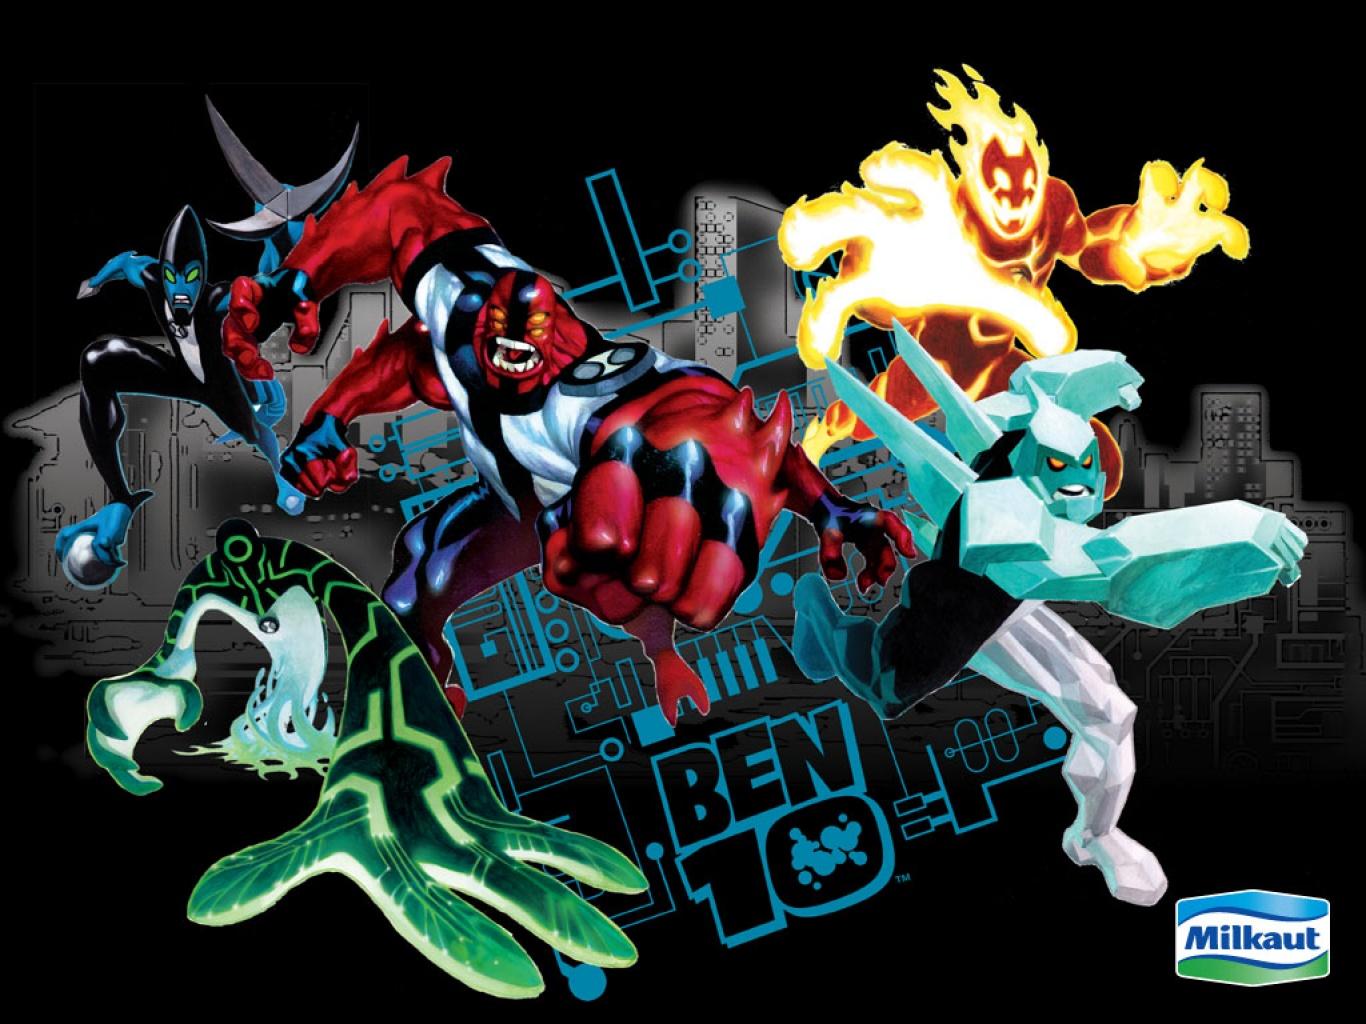 Ben10 Omniverse Feedback Alien design by Devilpig on